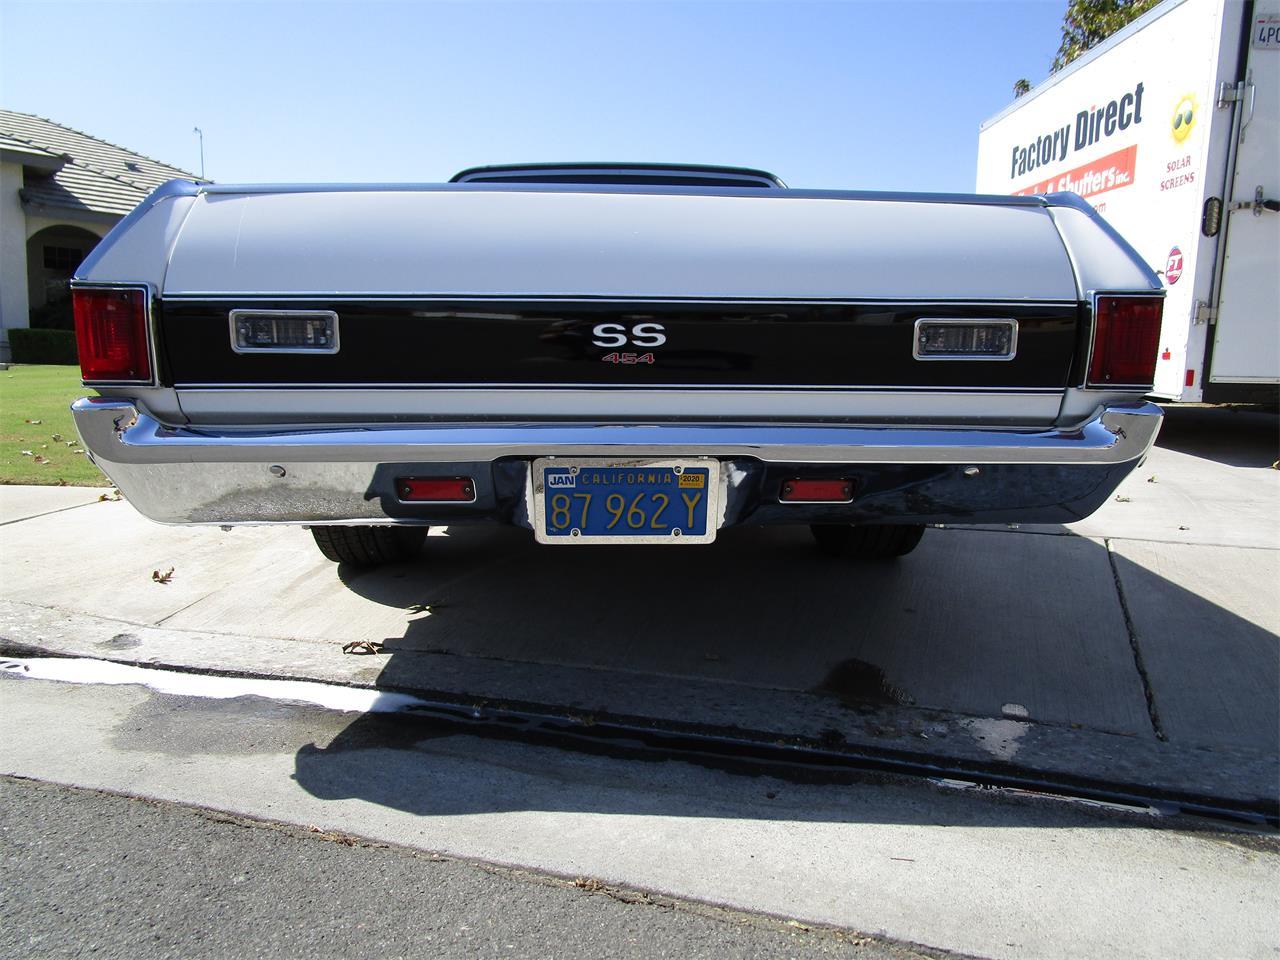 1971 Chevrolet El Camino SS (CC-1299007) for sale in Bakersfield, California